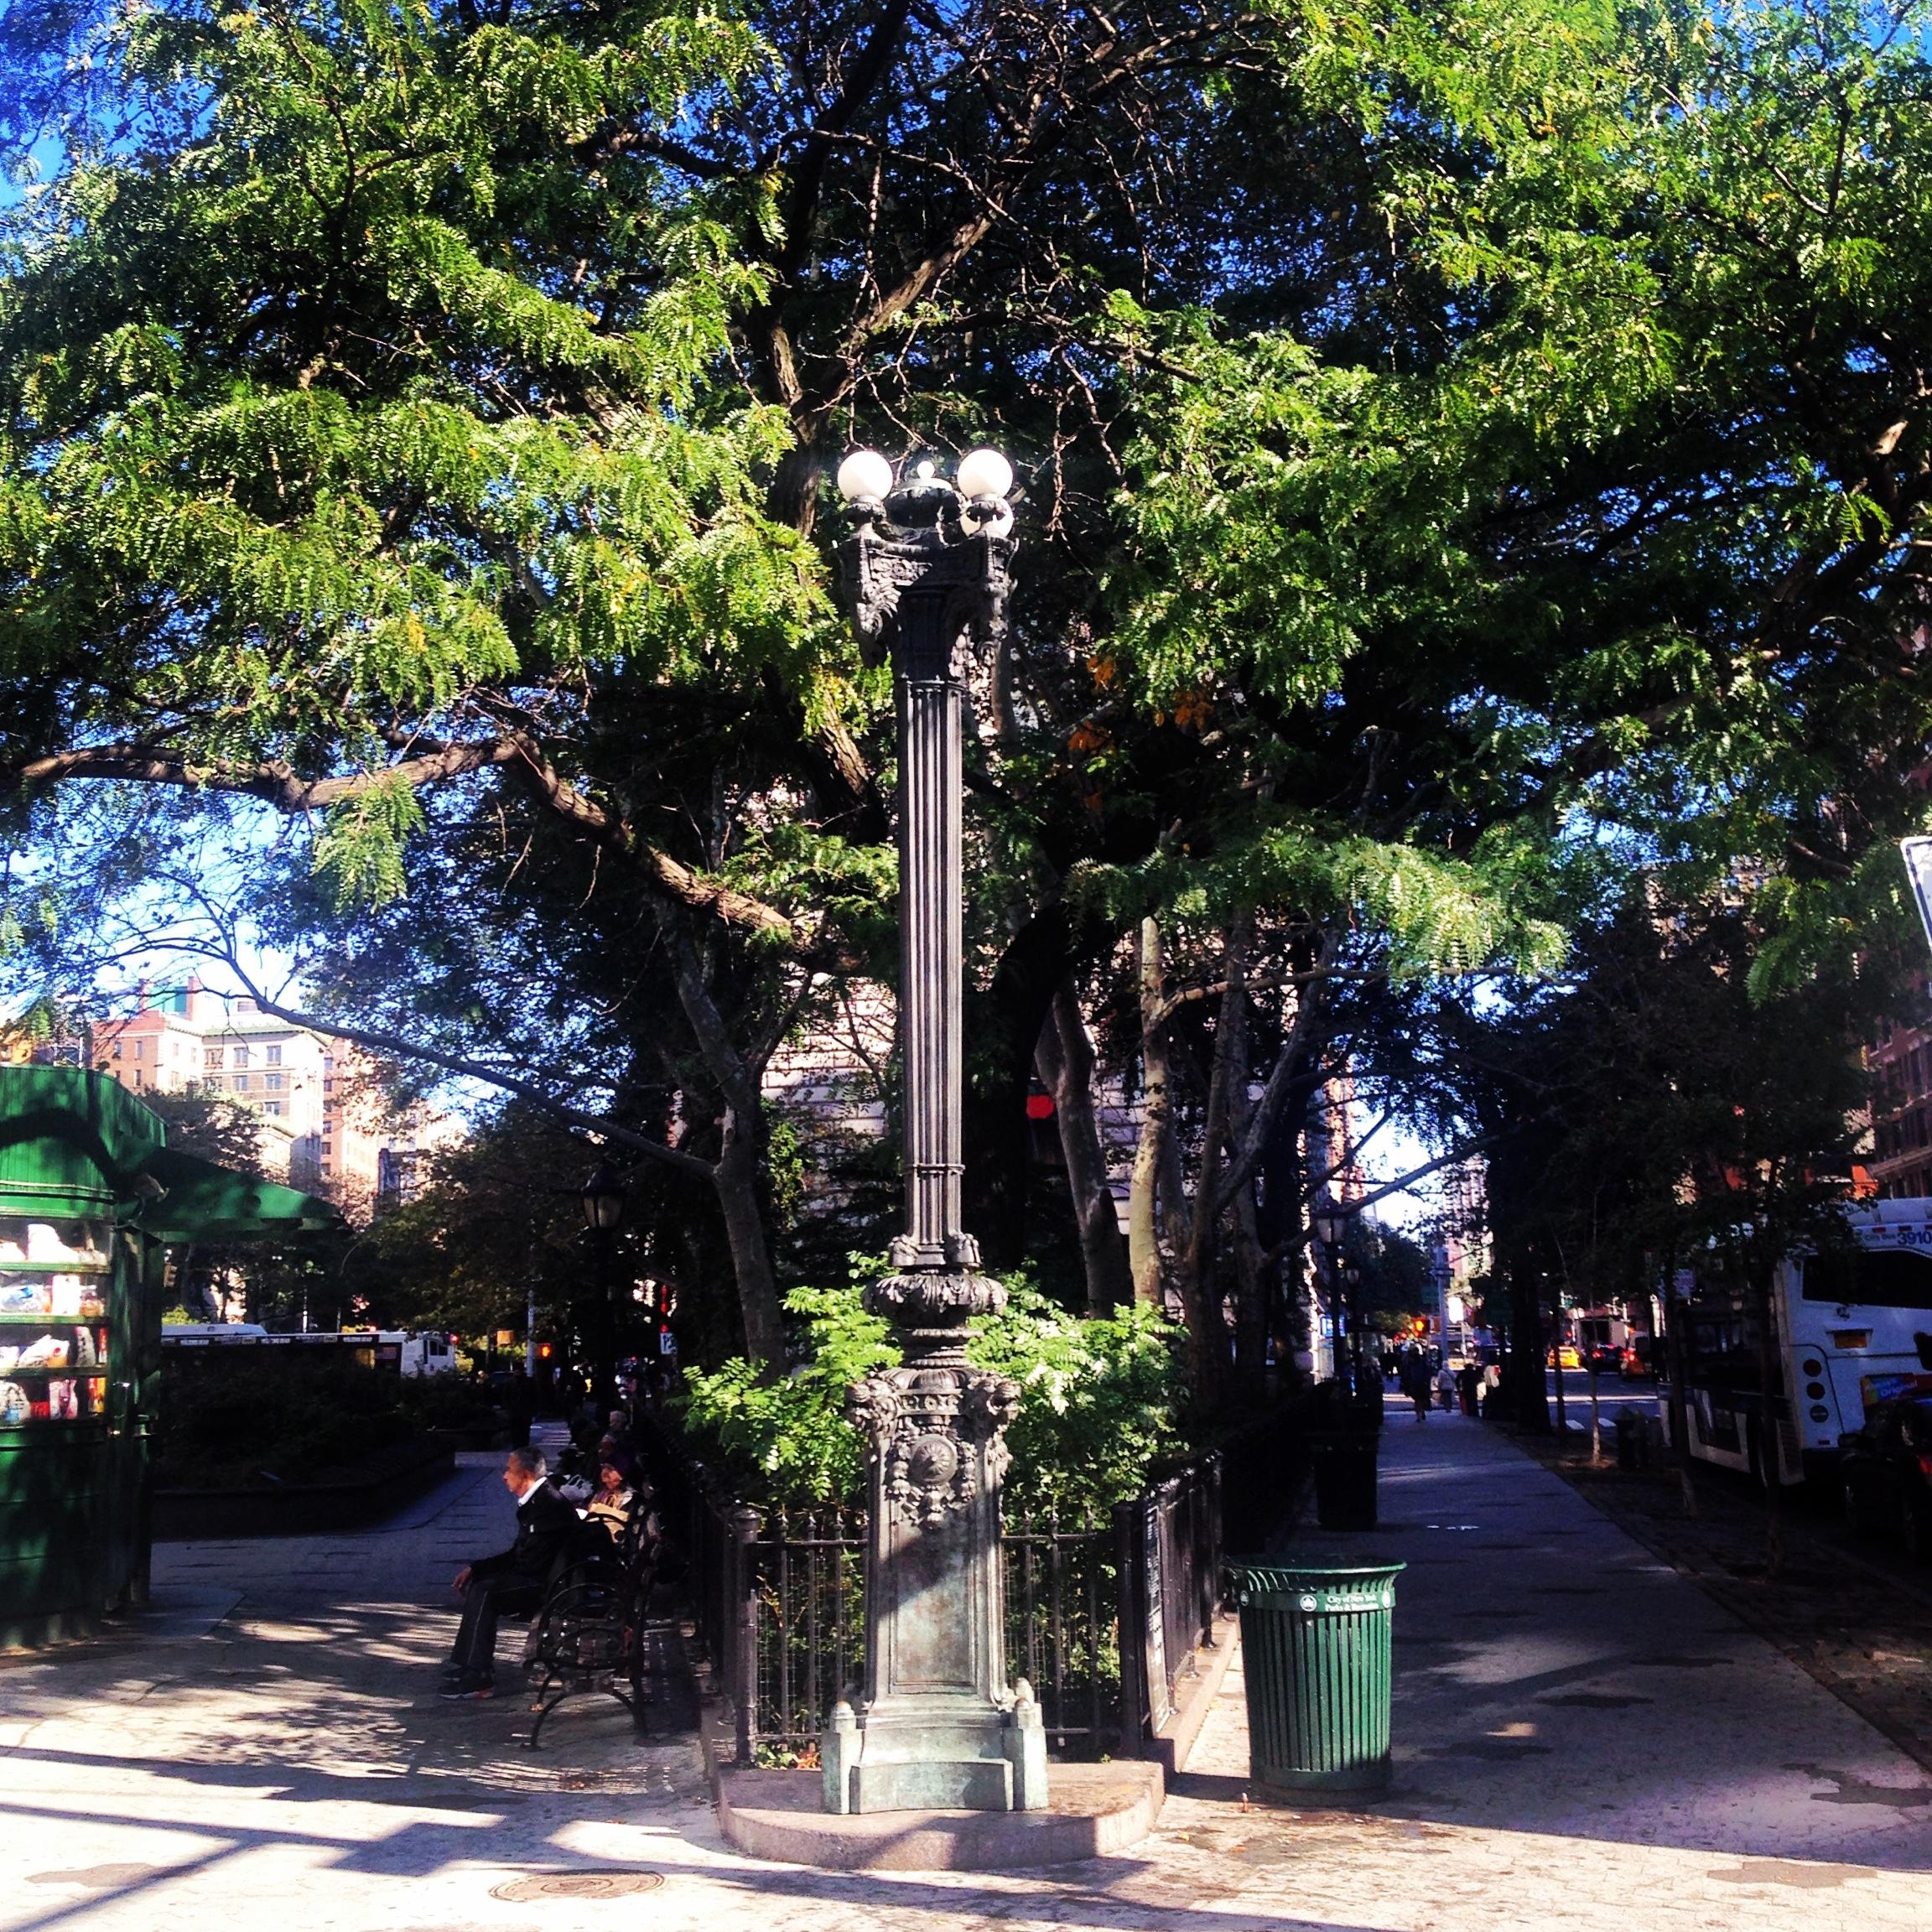 Nowy Jork Verdi Square Manhattan